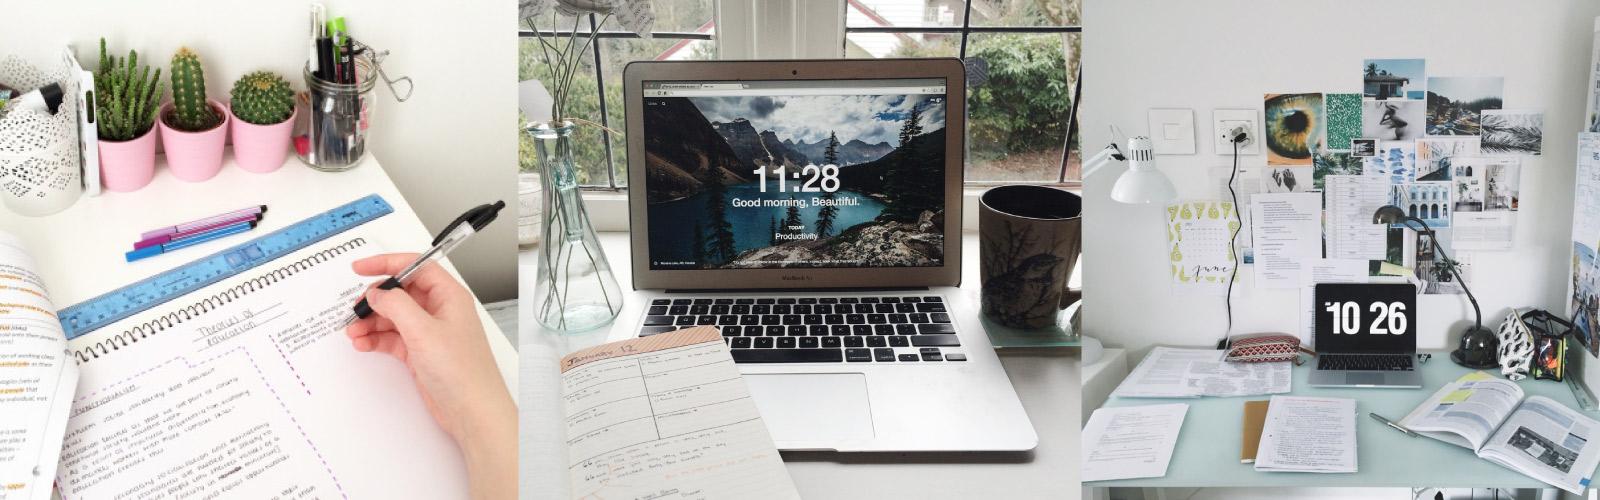 starting a studyblr